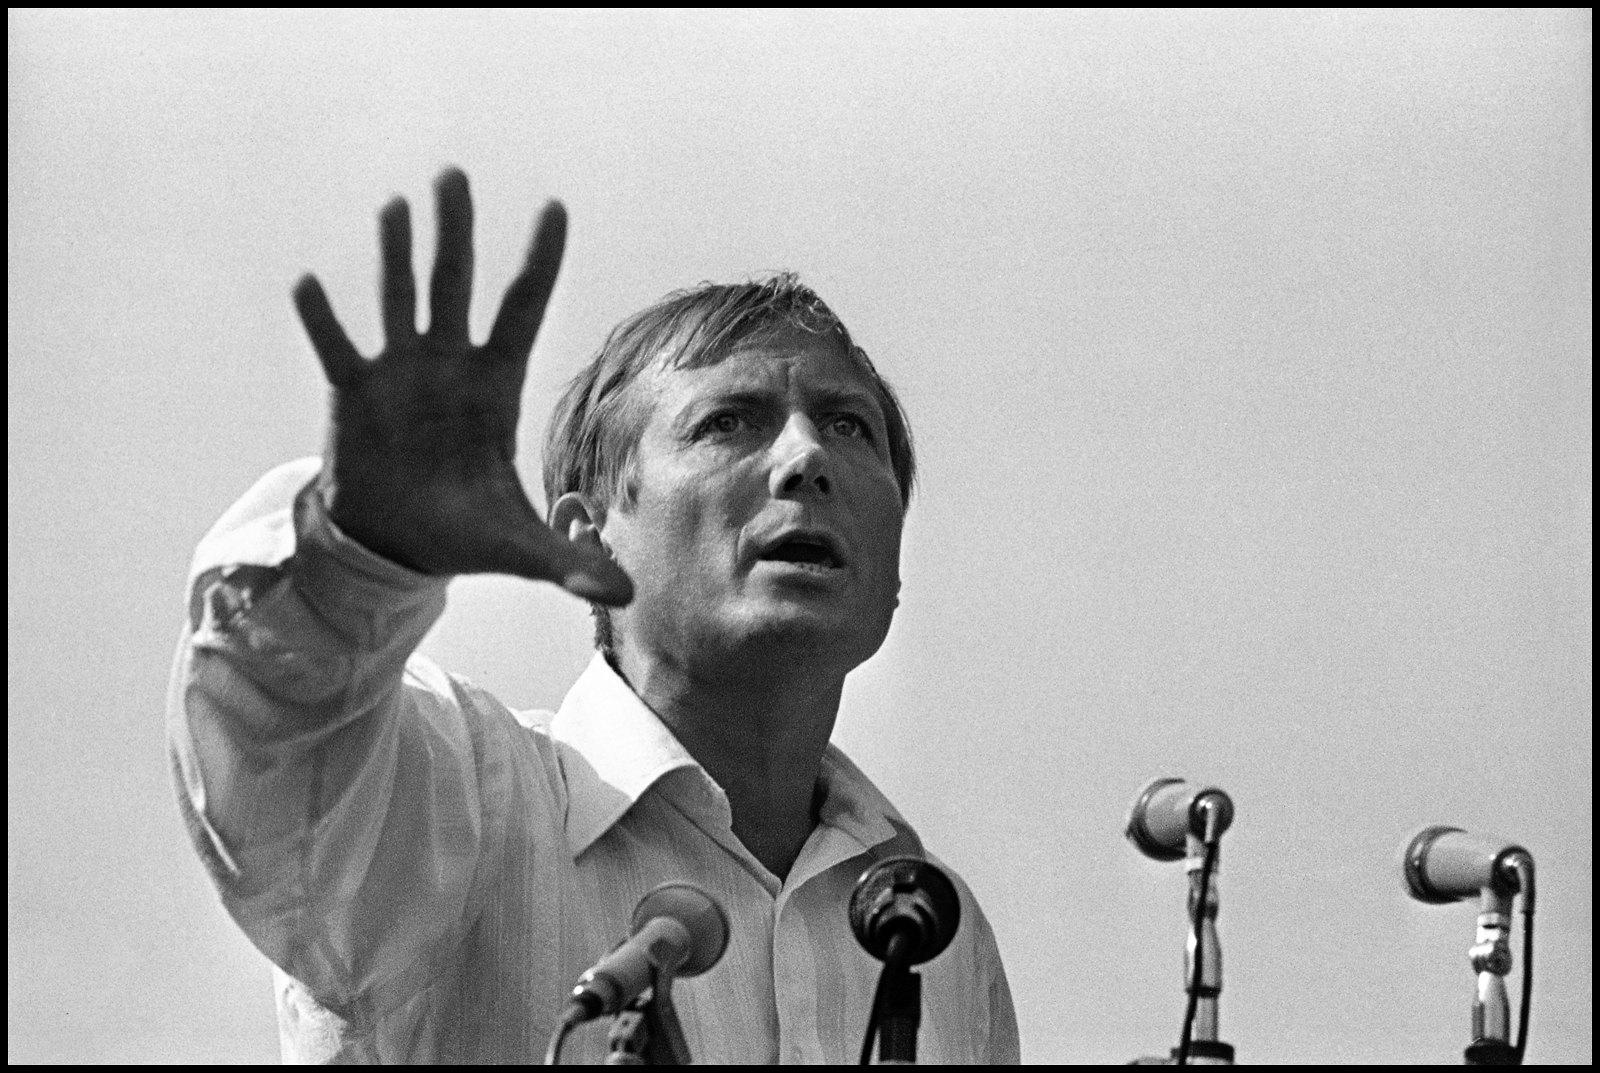 1974. Поэт Евгений Евтушенко на Блоковском фестивале